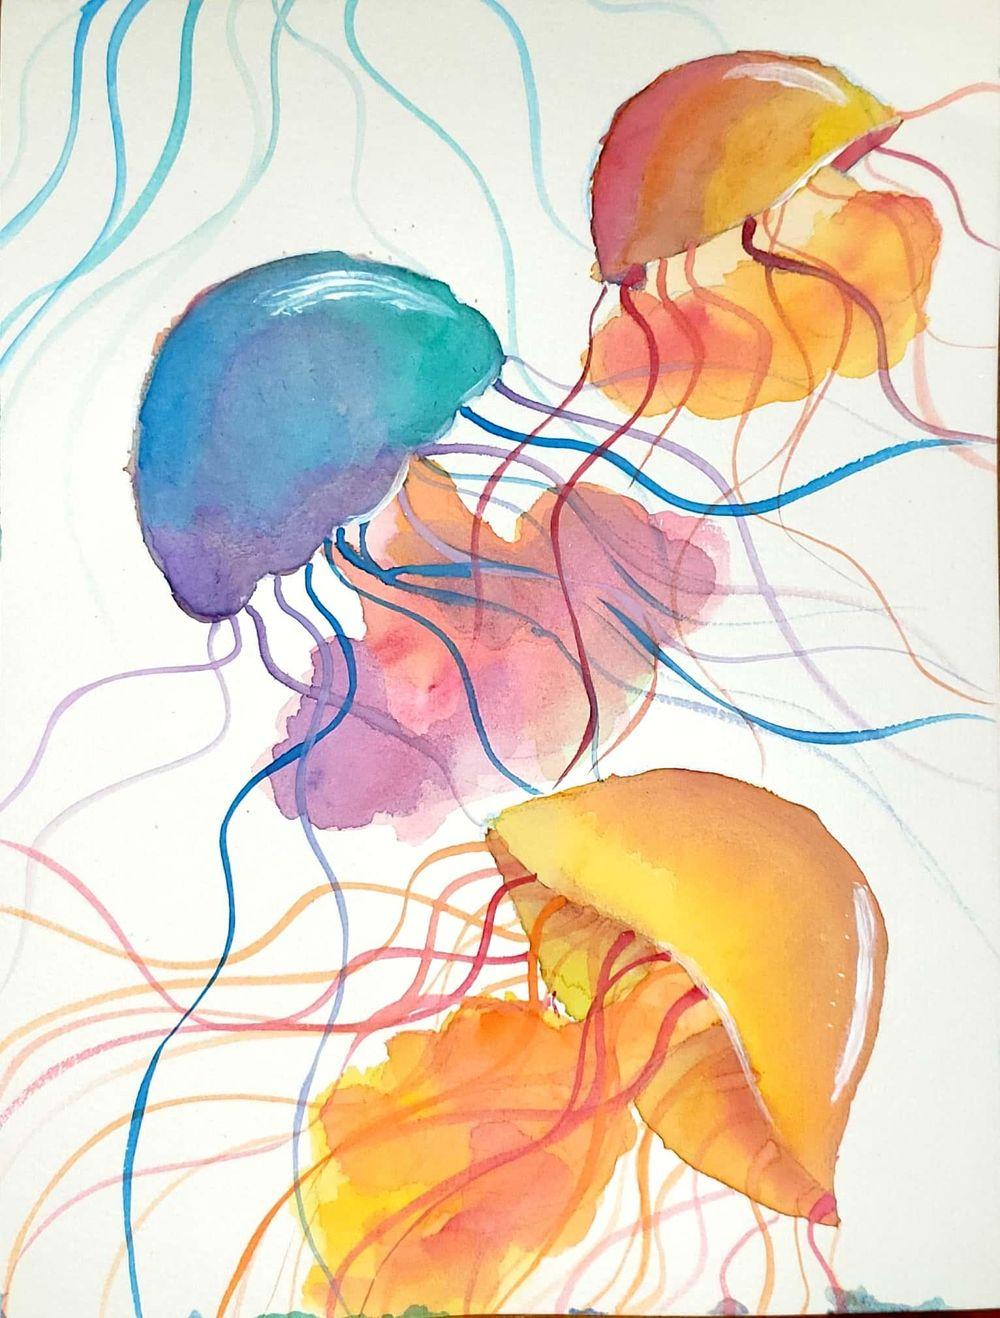 Wonderful Watercolors! - image 3 - student project